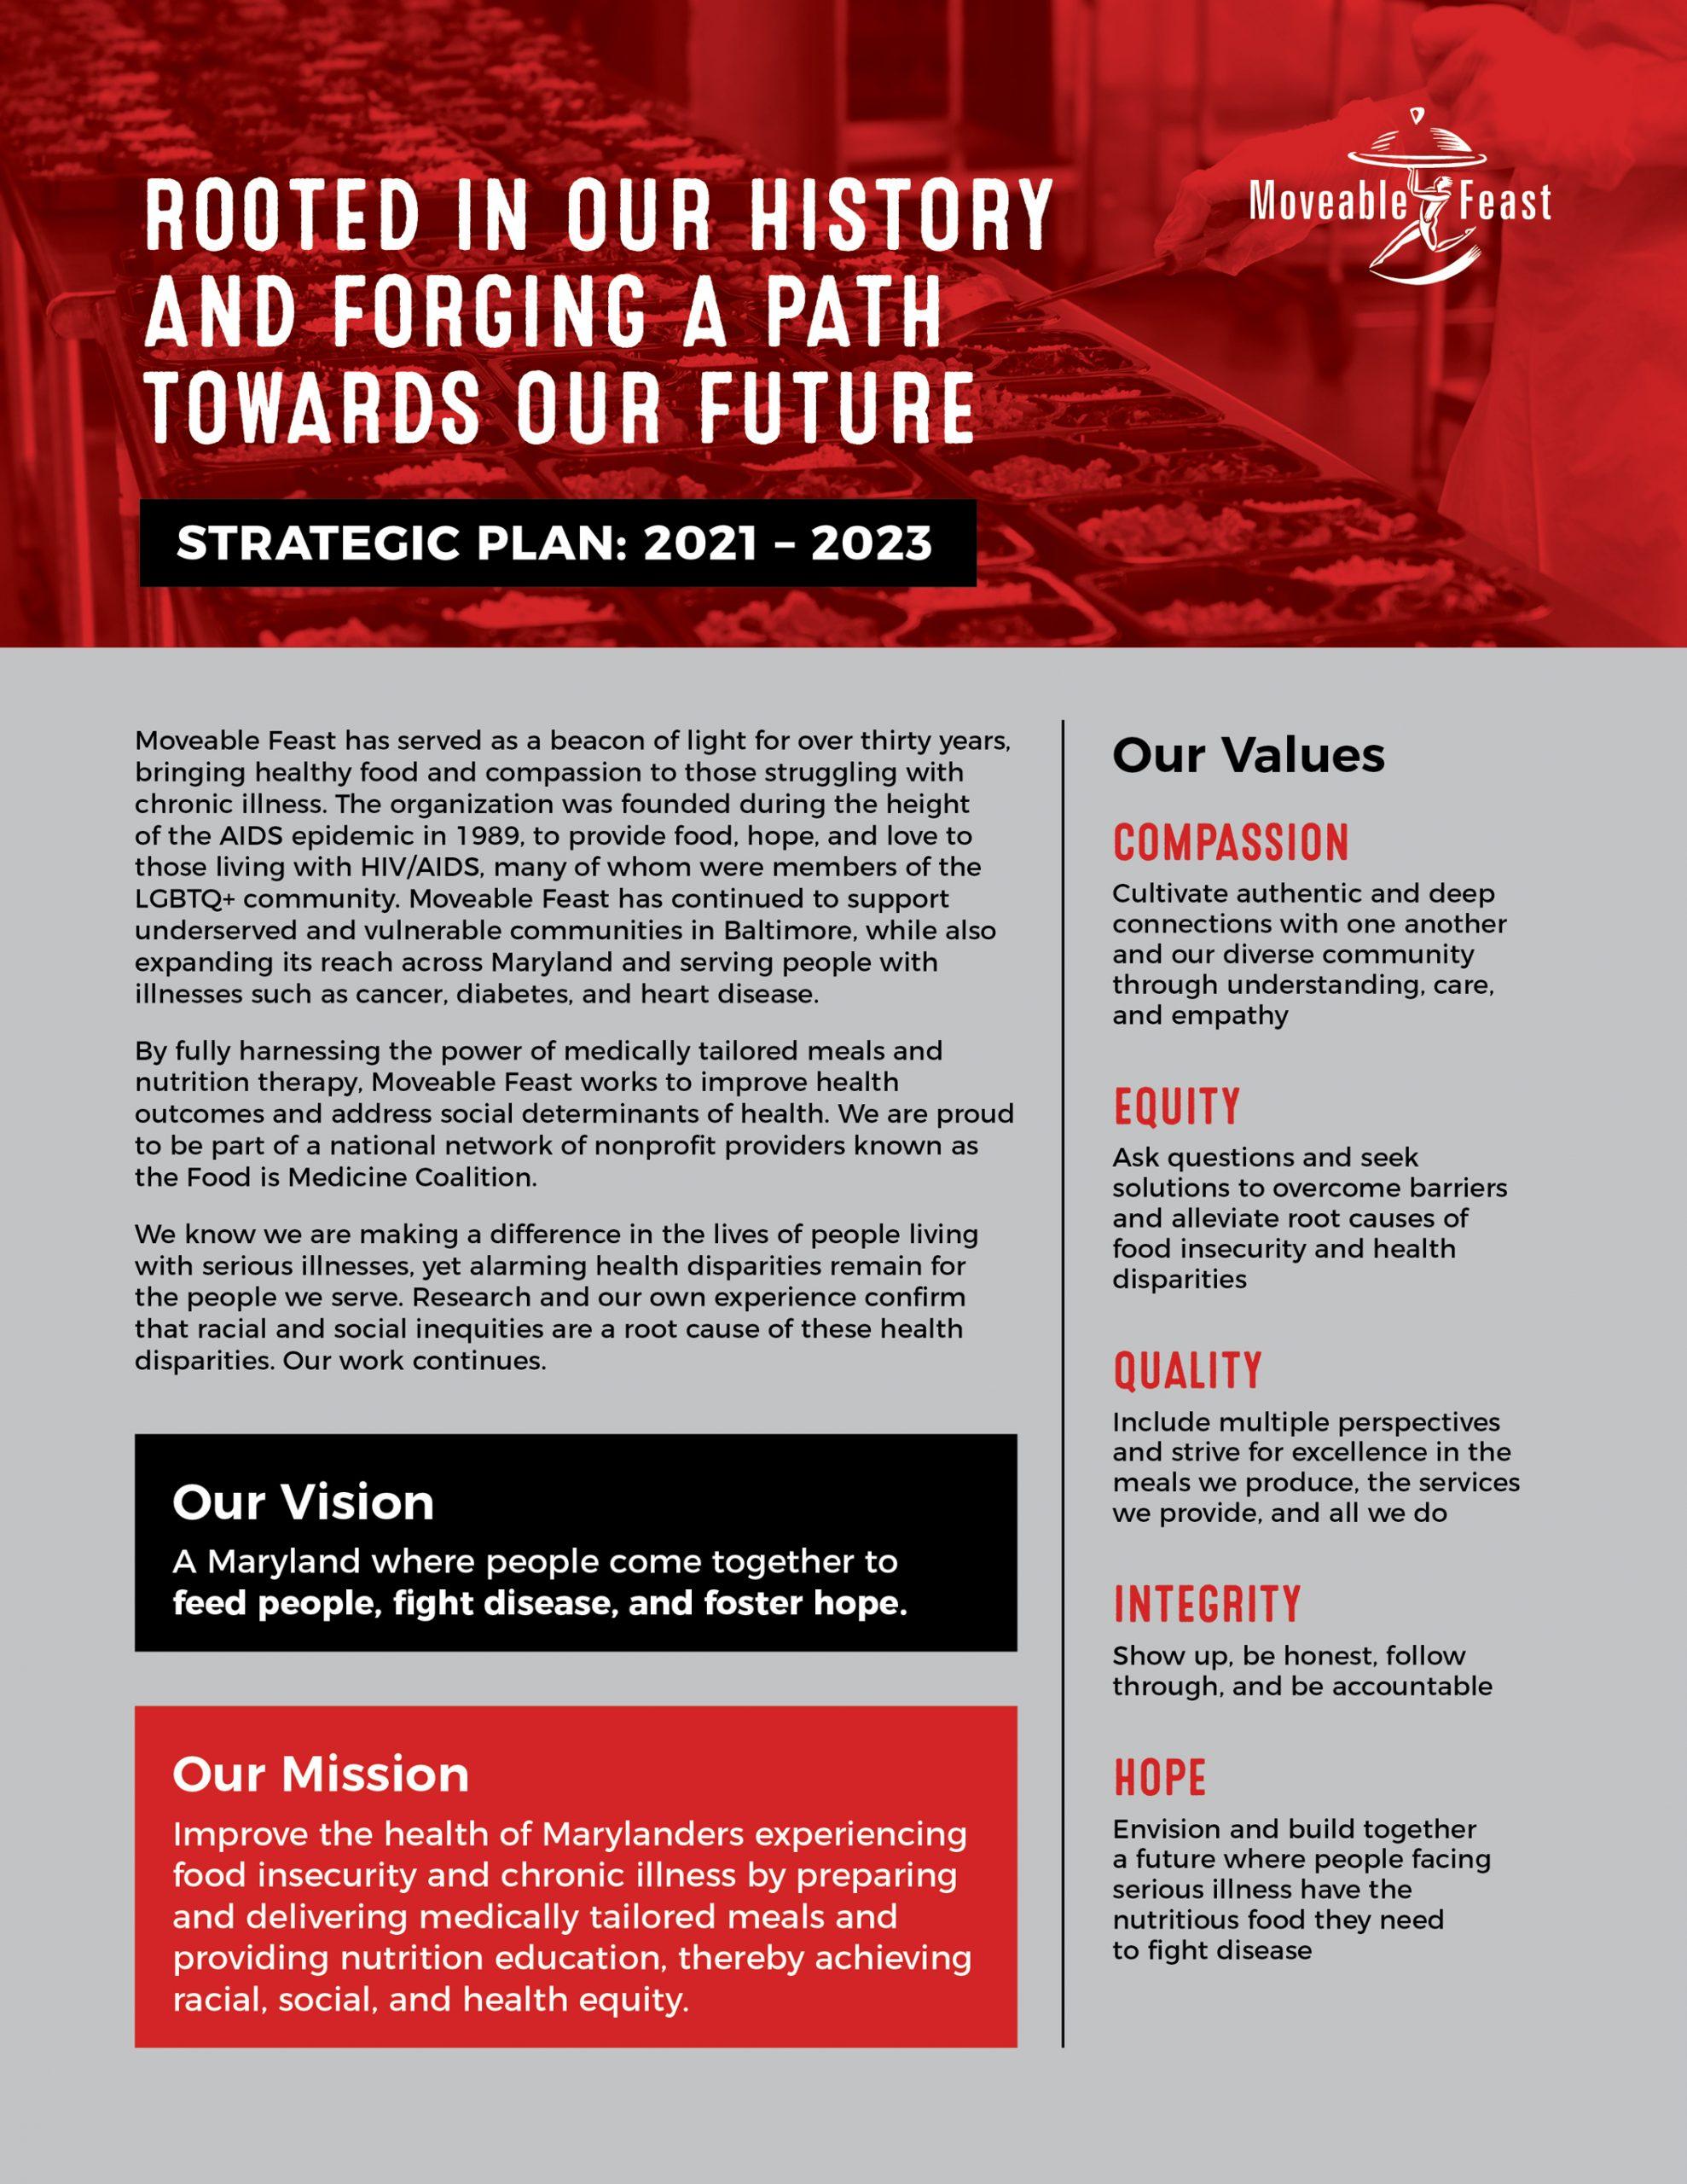 Moveable Feast Strategic Plan